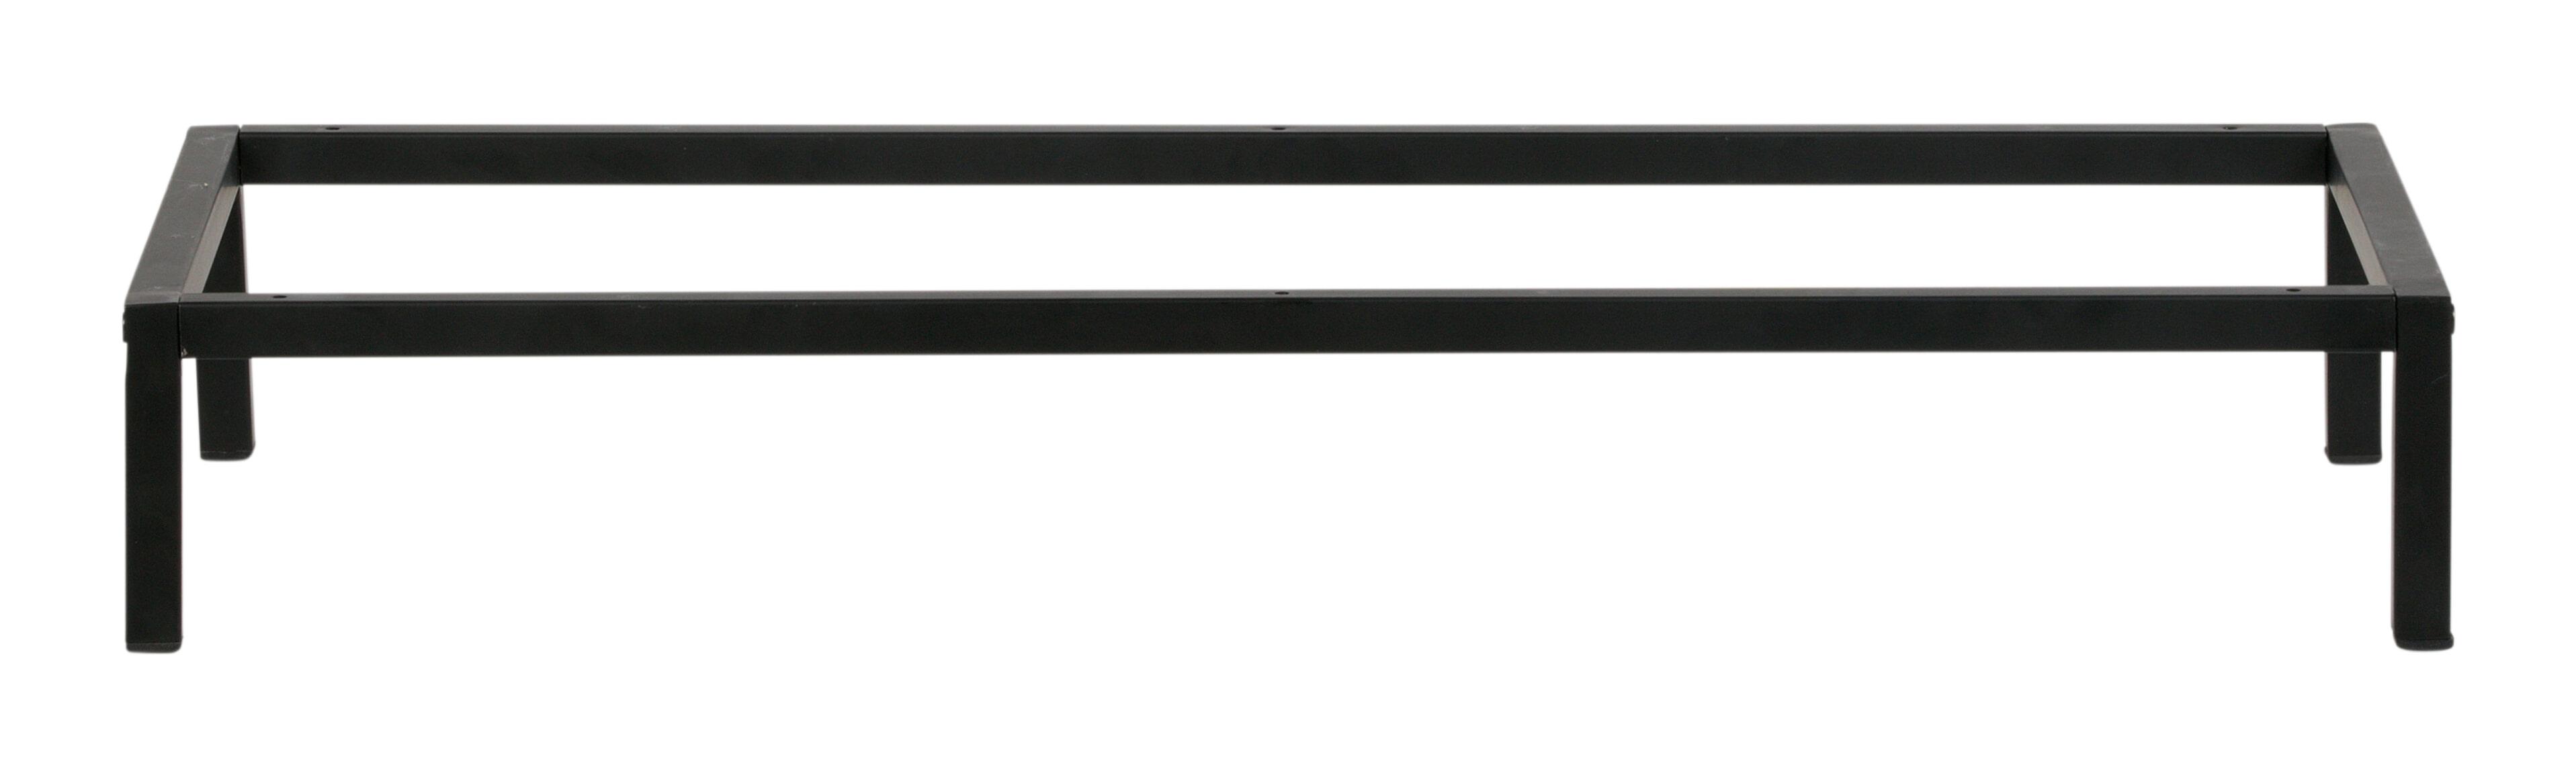 vtwonen Kastonderstel 'Lower case' kleur Zwart